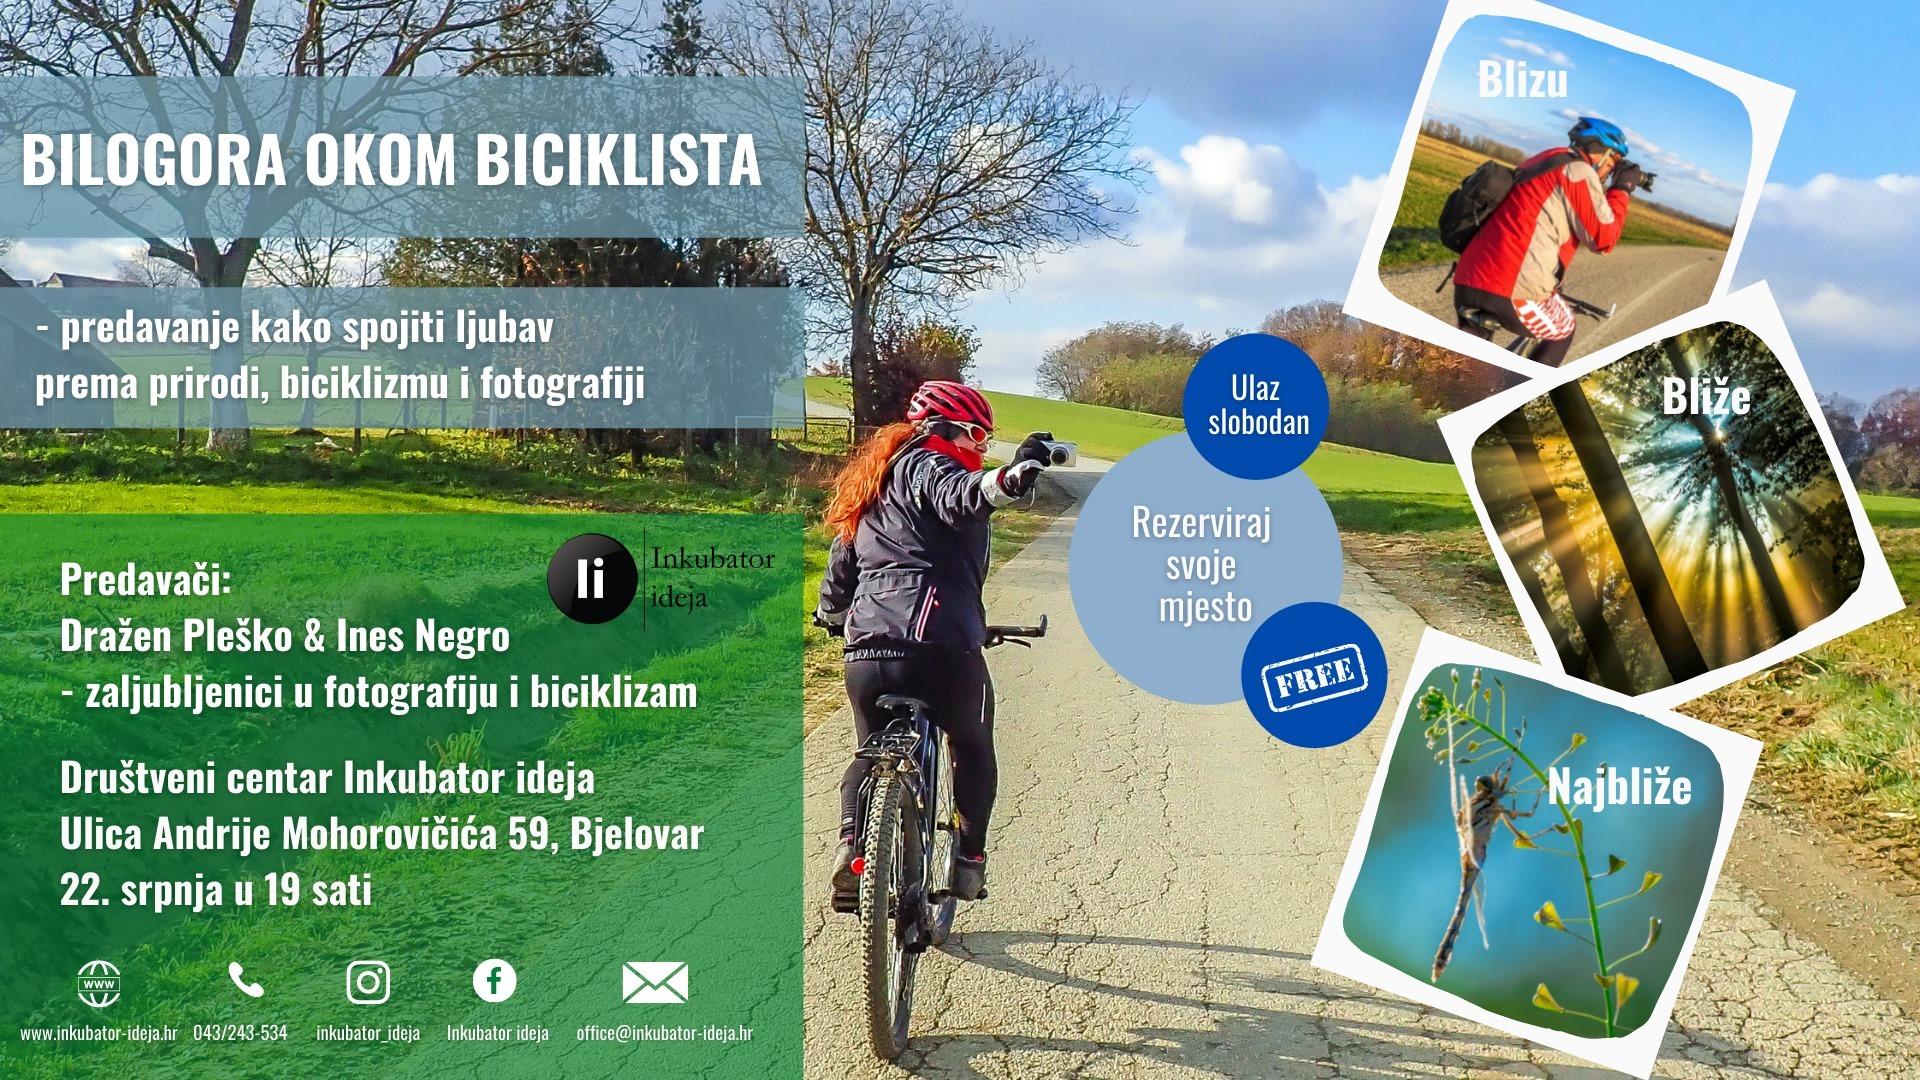 Bilogora okom biciklista - blizu, bliže najbliže!